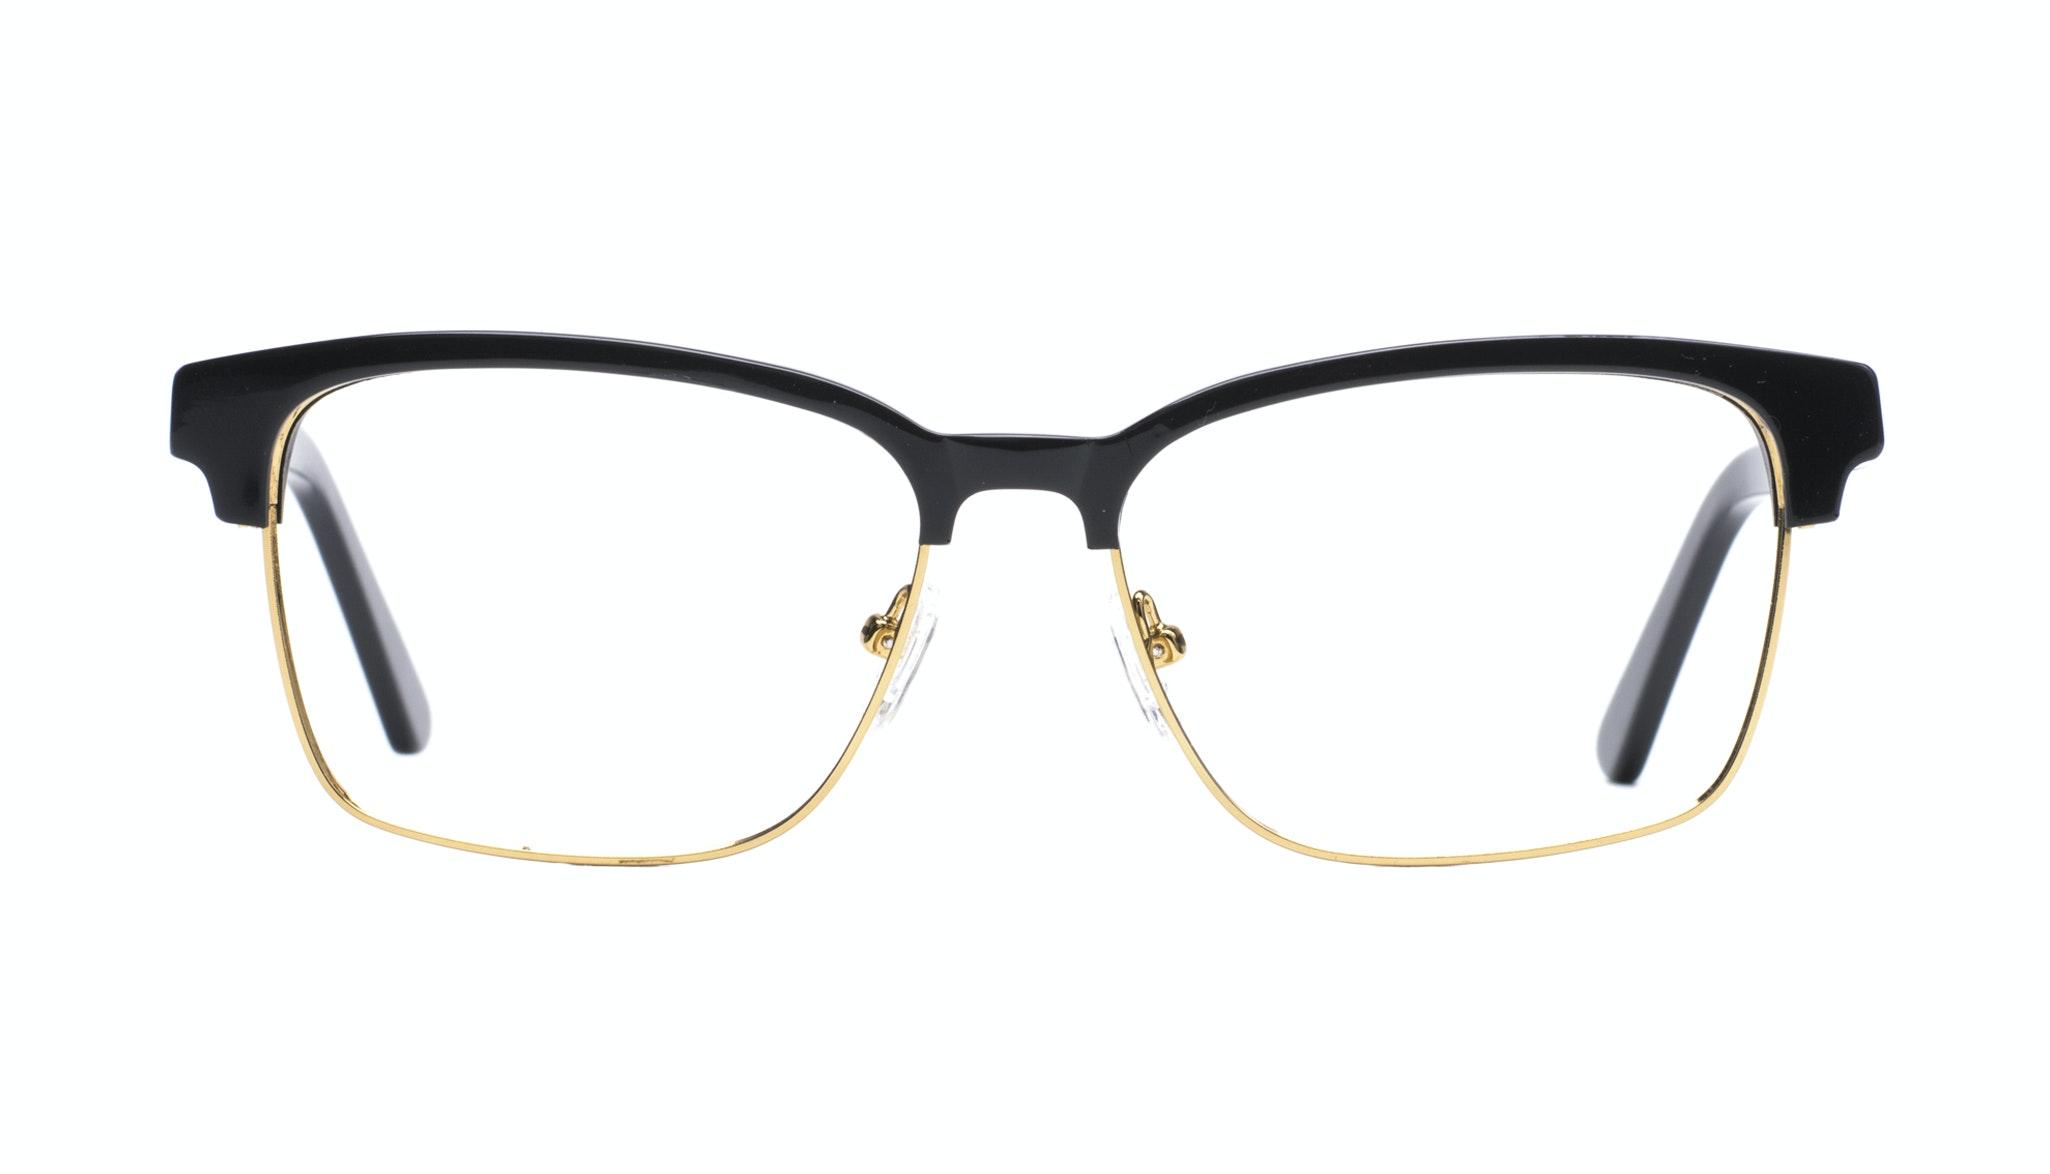 Affordable Fashion Glasses Rectangle Square Eyeglasses Men Gallery Black